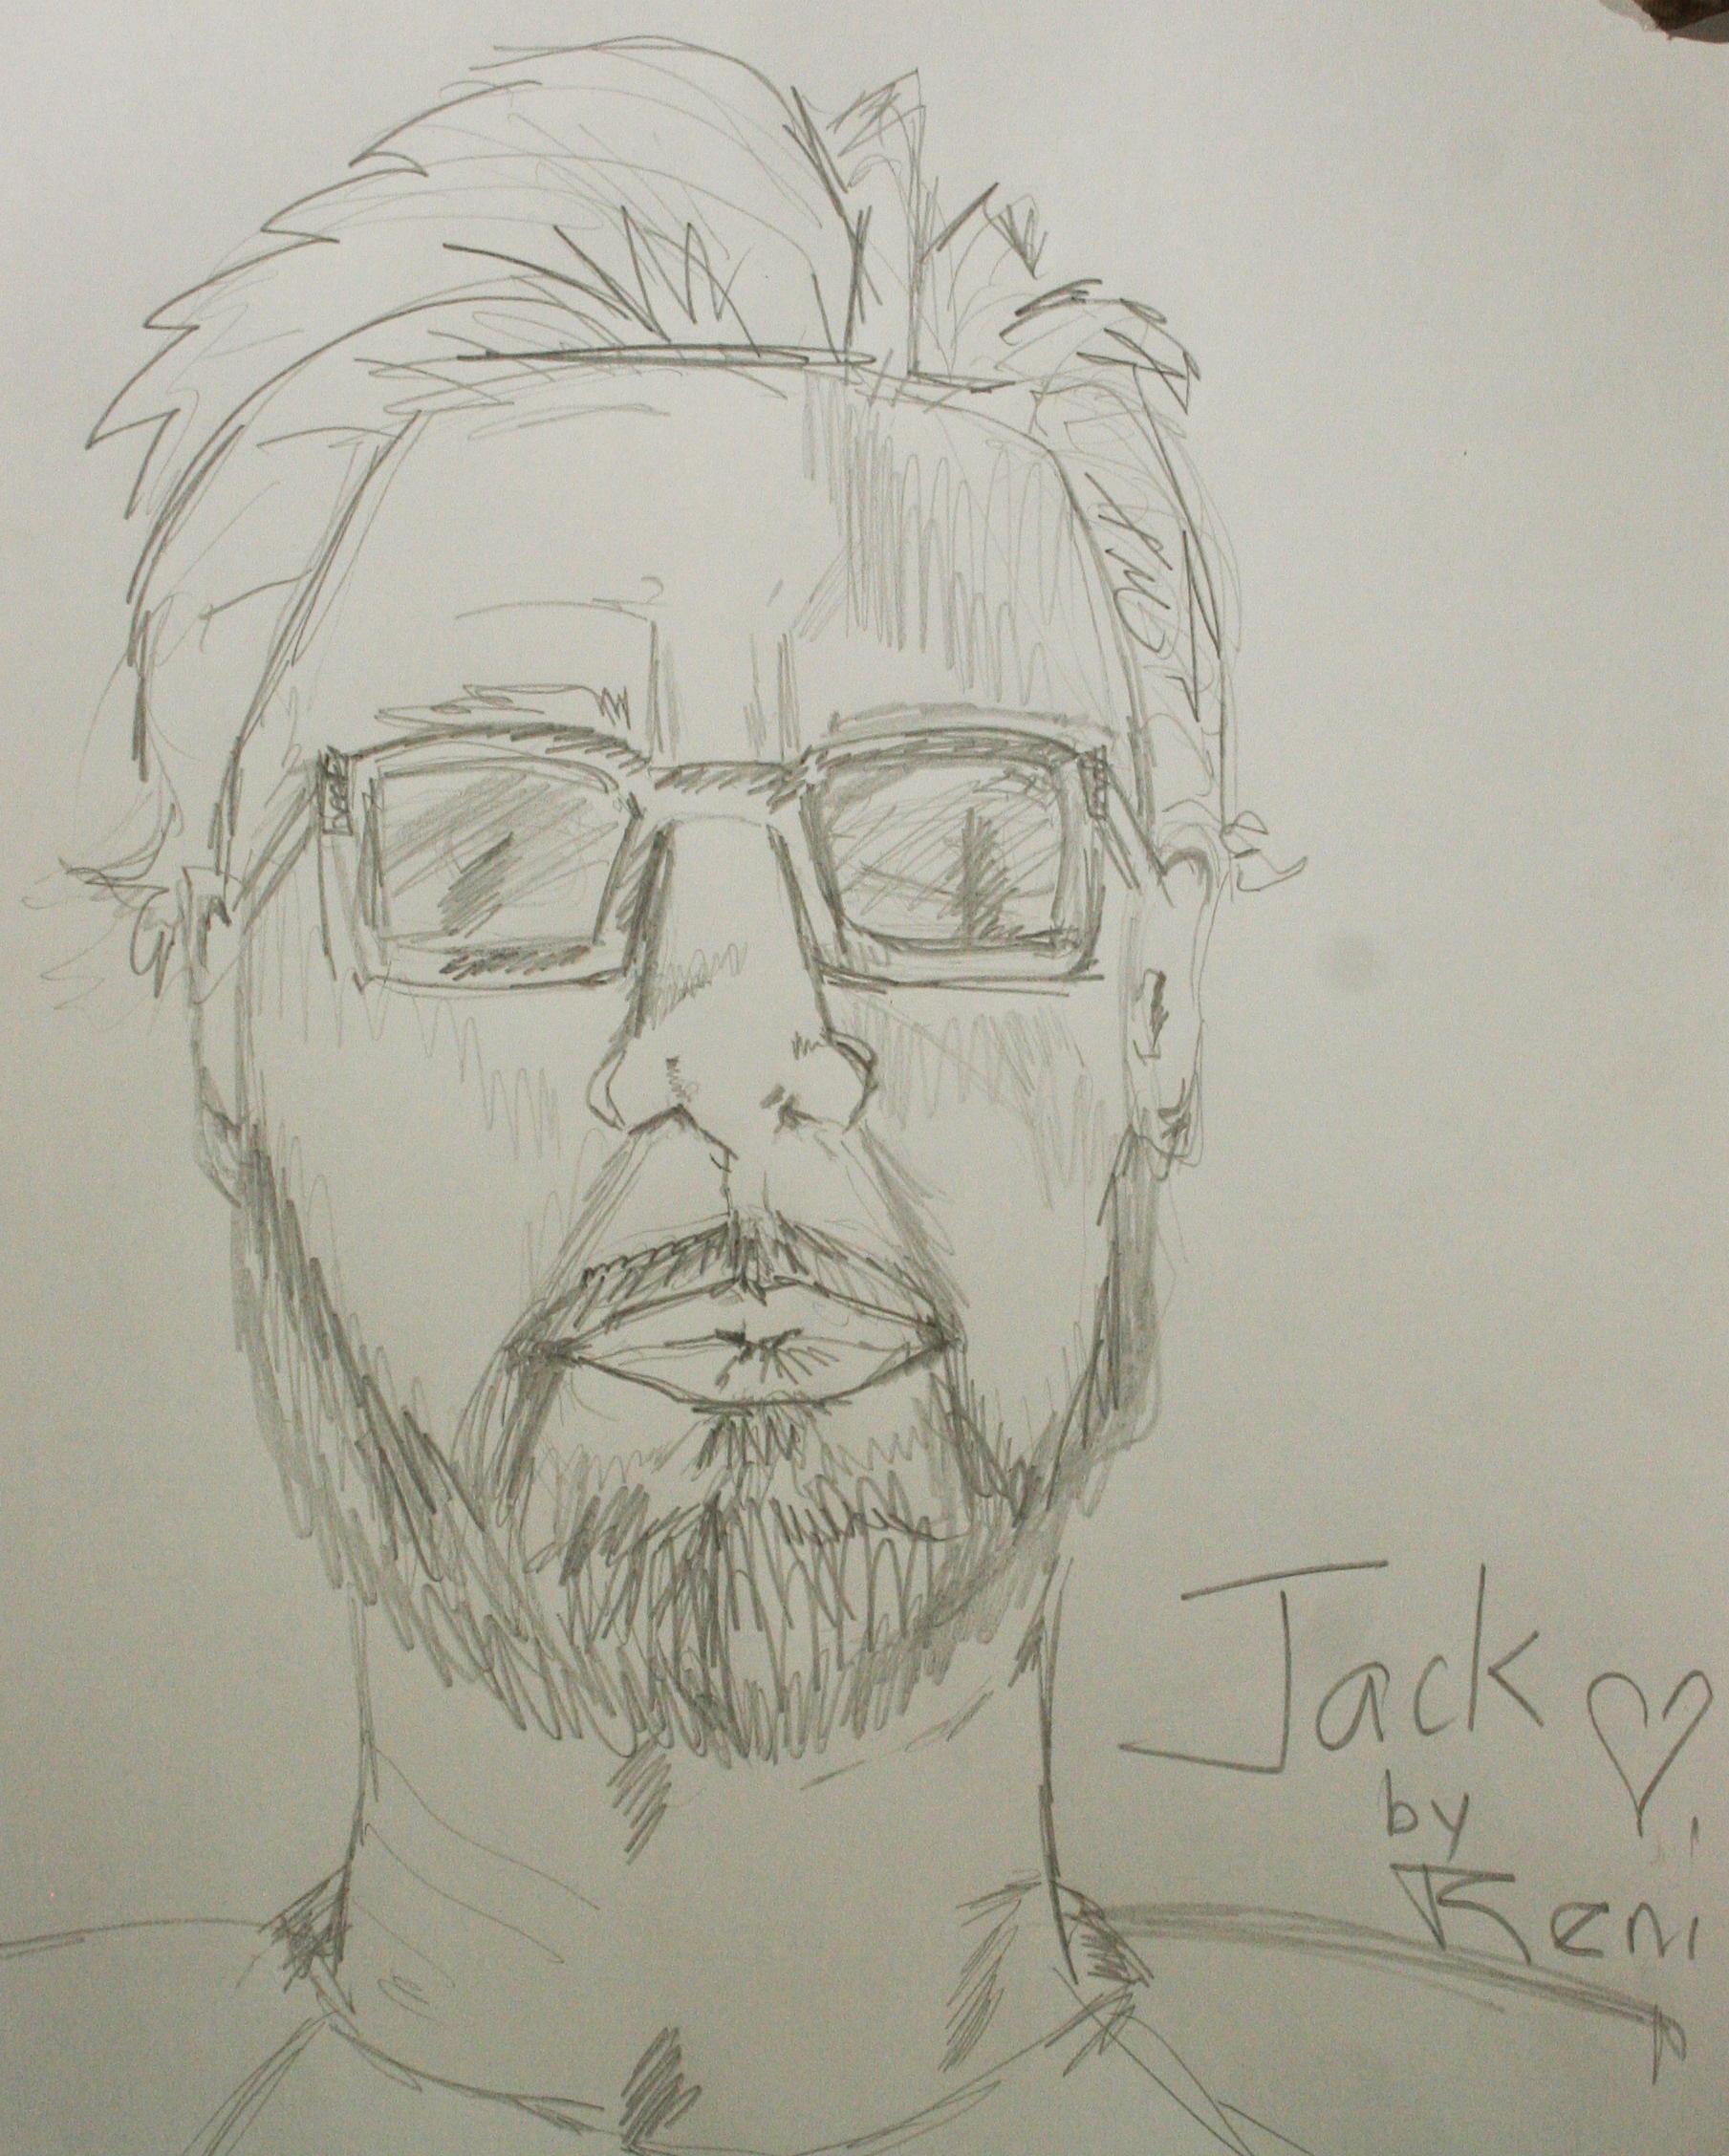 Renata Jenkins did this half hour sketch.